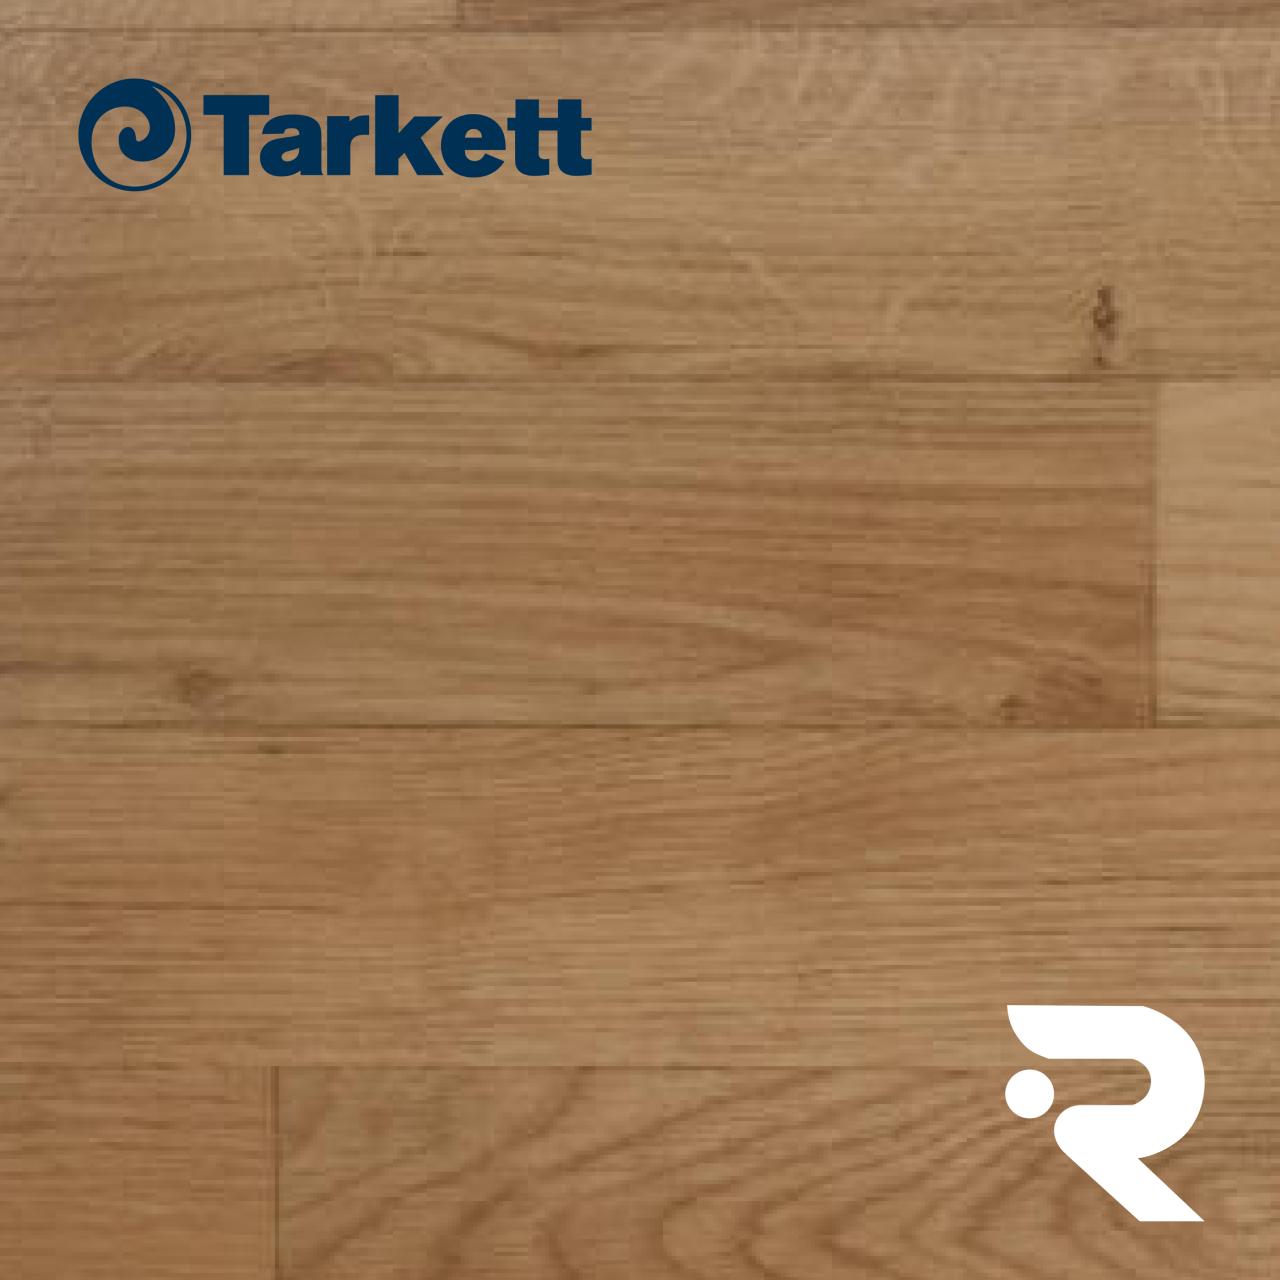 🏐 Спортивне покриття Tarkett   Oak OAK CLASSIK   OMNISPORTS V35   2 х 20.5 м